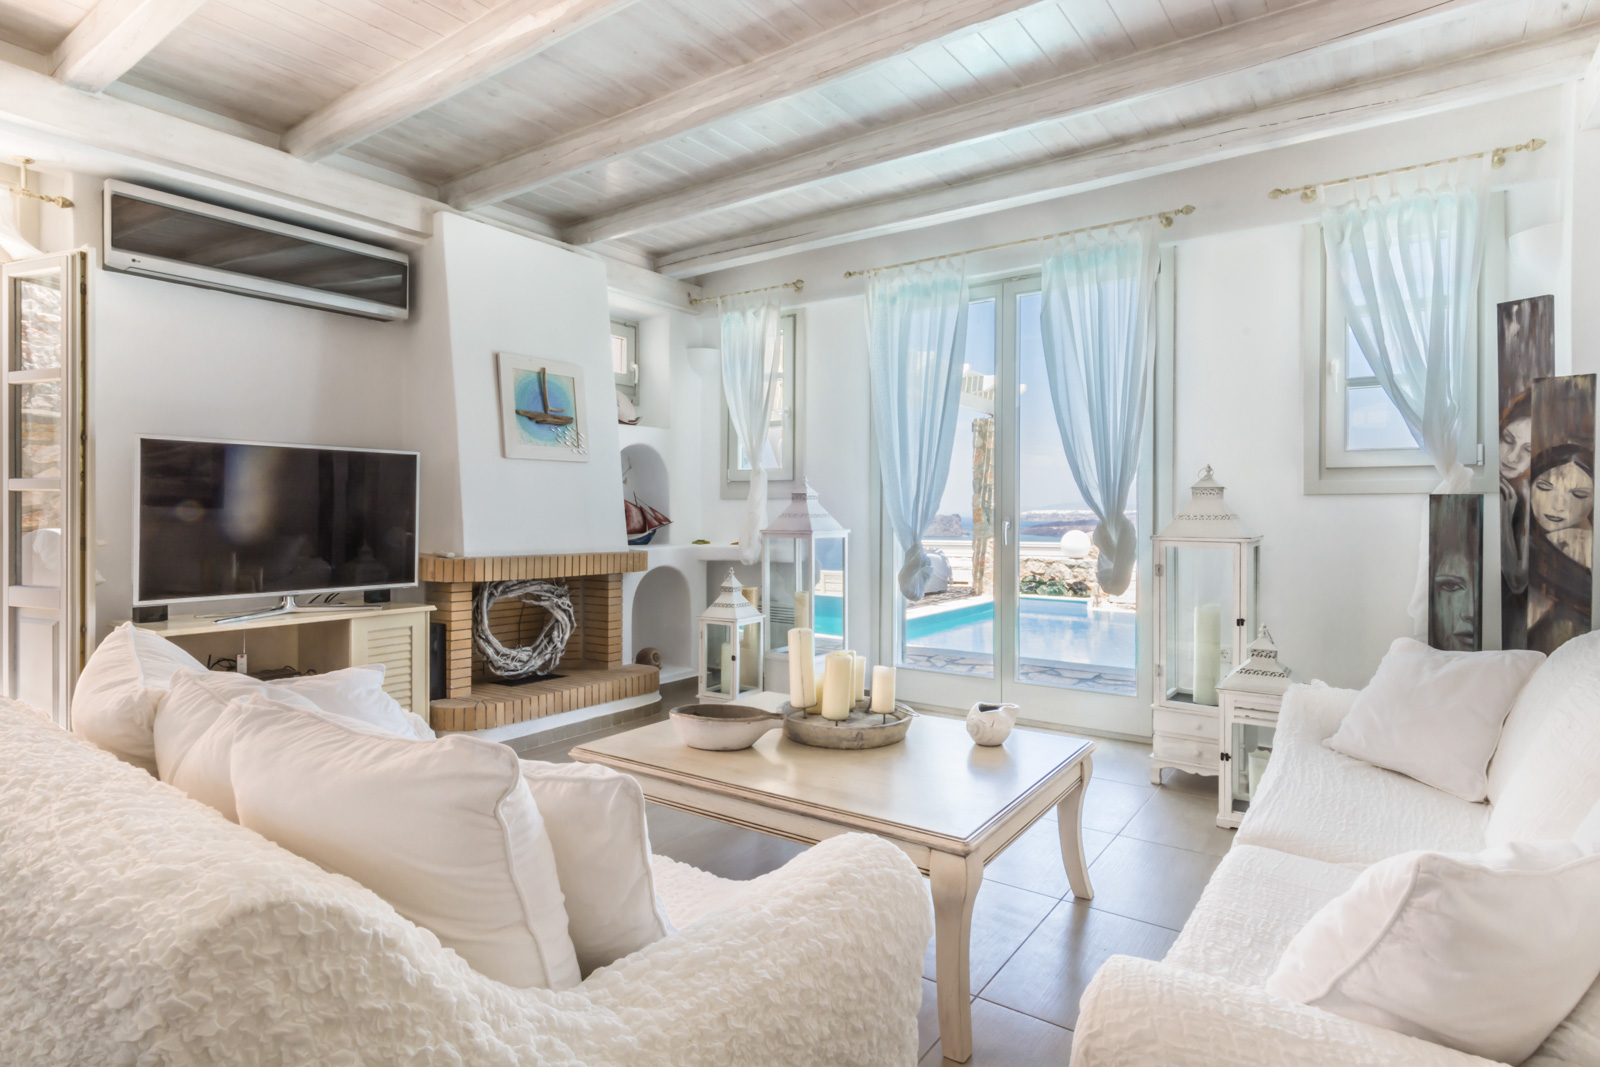 santorini villas 5 bedrooms lounge